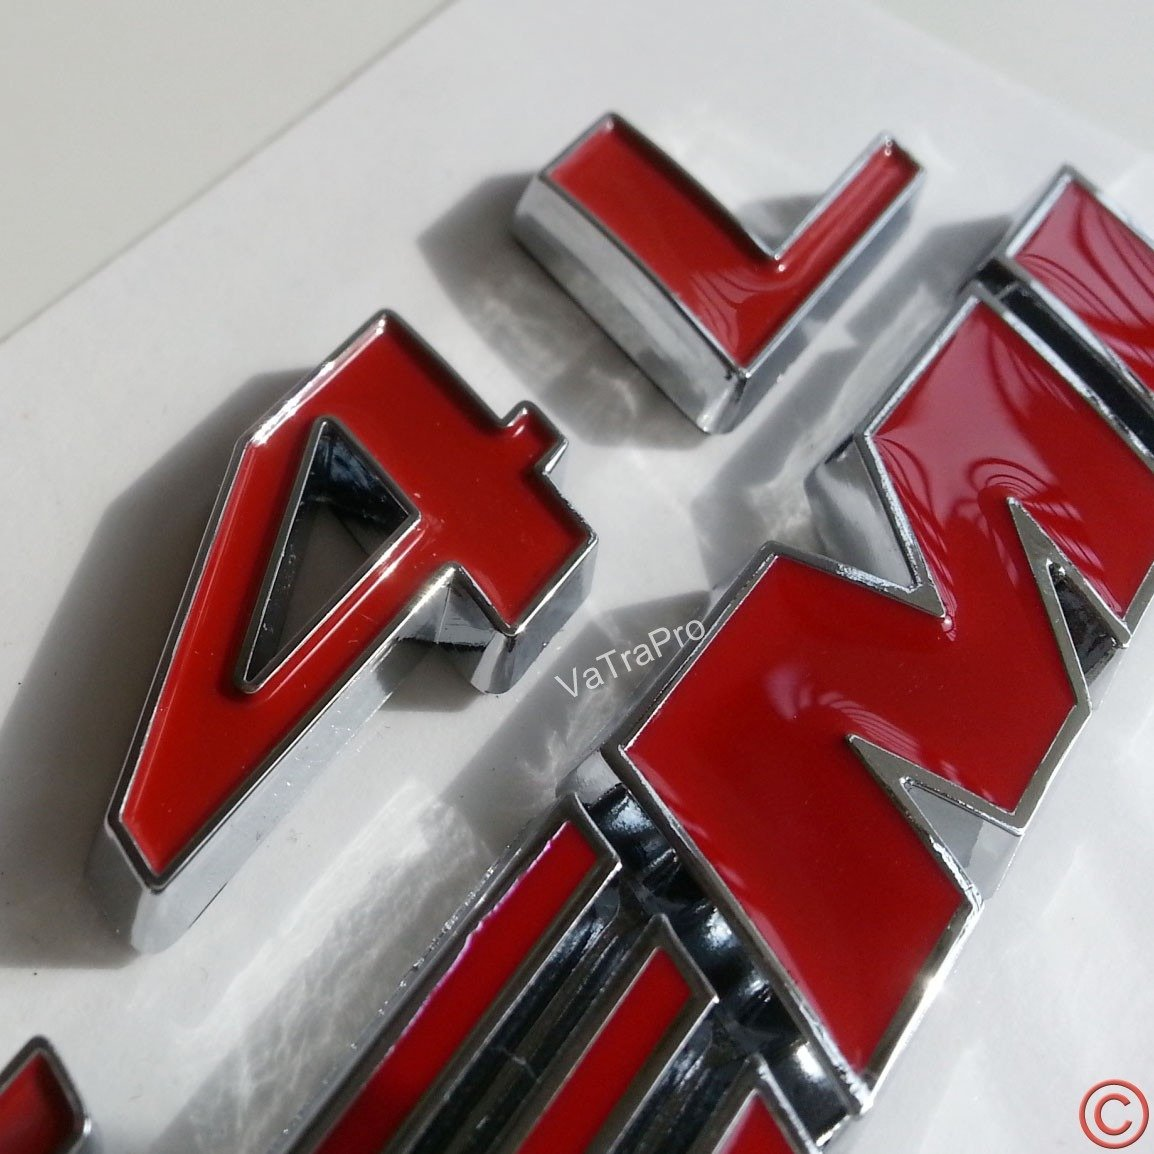 zorratin 6.4 L HEMI Emblem Badge Plate Decal with Sticker for Dodge Challenger SRT 6.4L SRT8 Jeep red+white